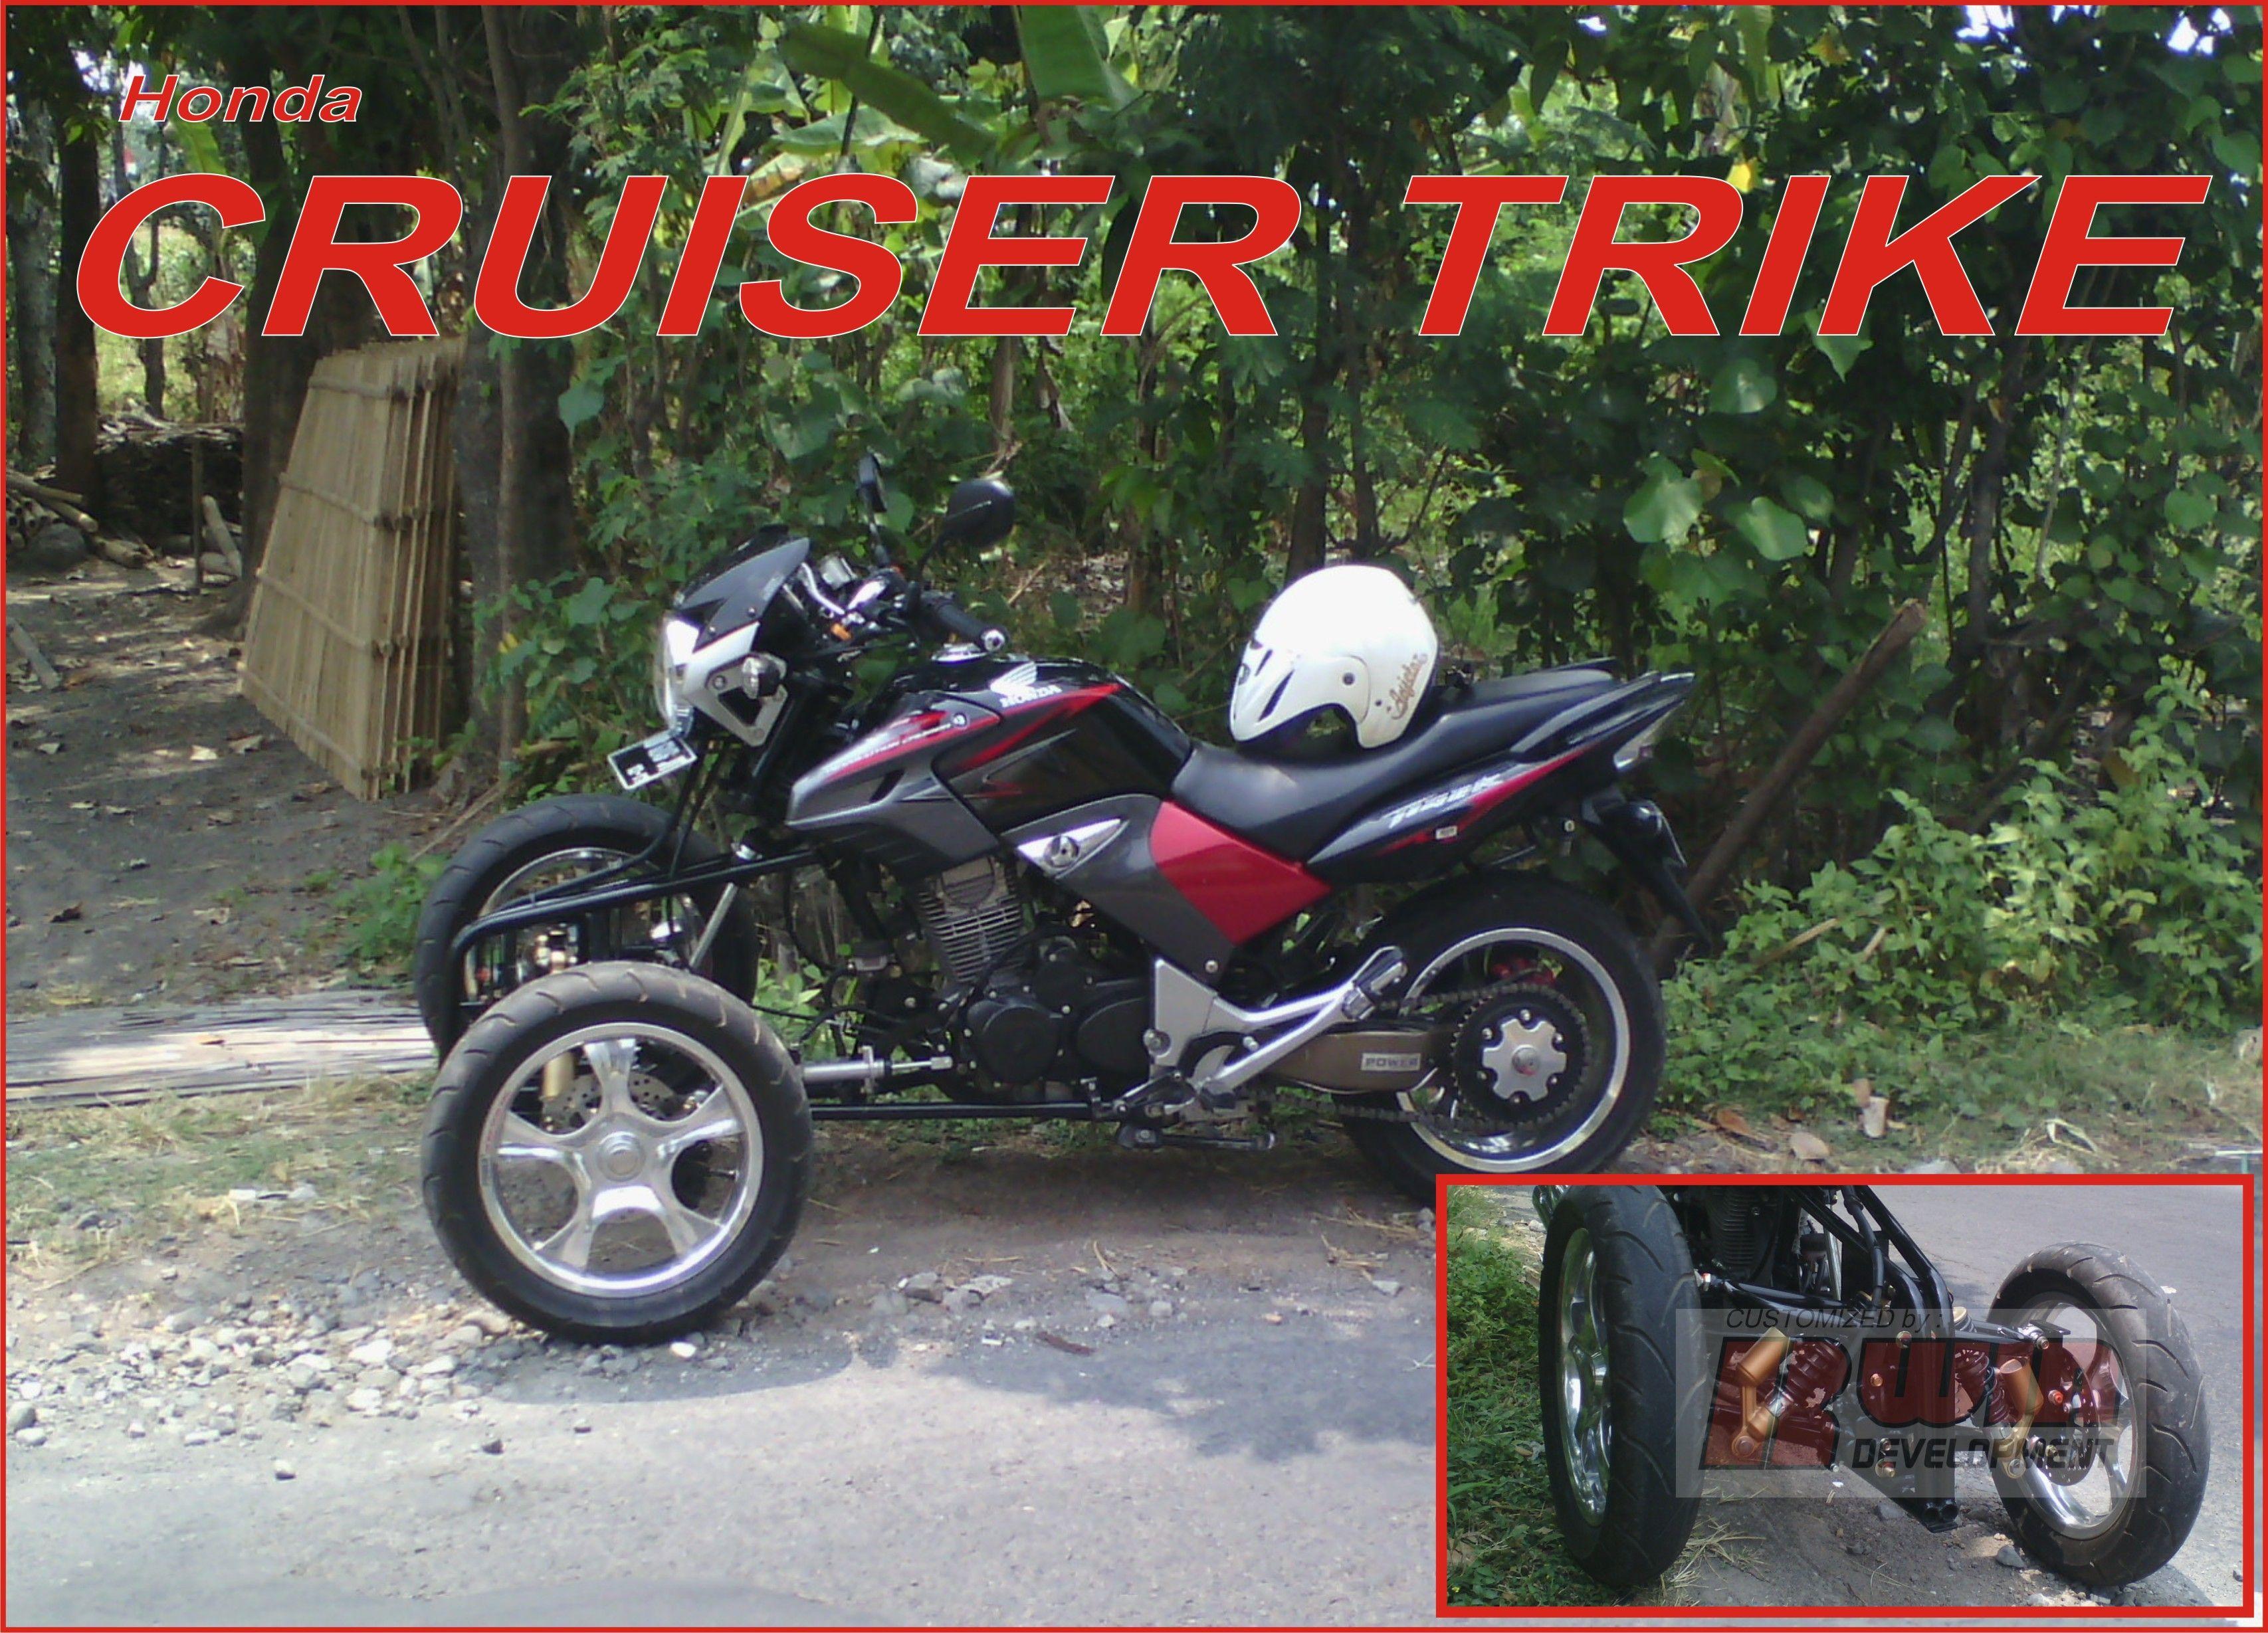 Car amp bike fanatics suzuki m50 bobber bike - Honda Gl 200 Tiger Reverse Trike